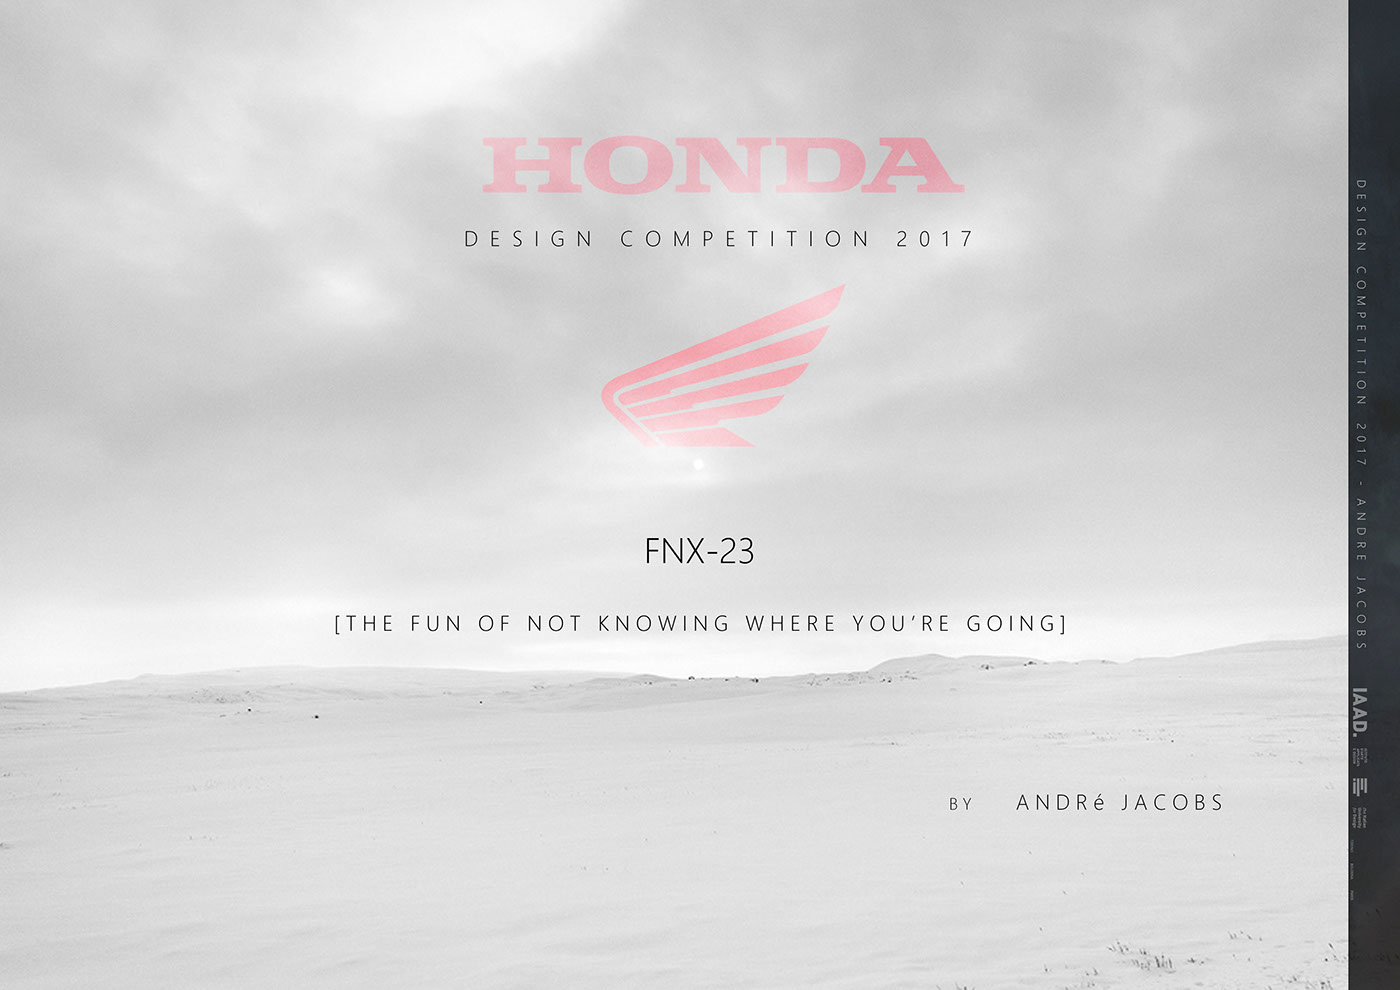 Honda Design Contest 2017 on Behance